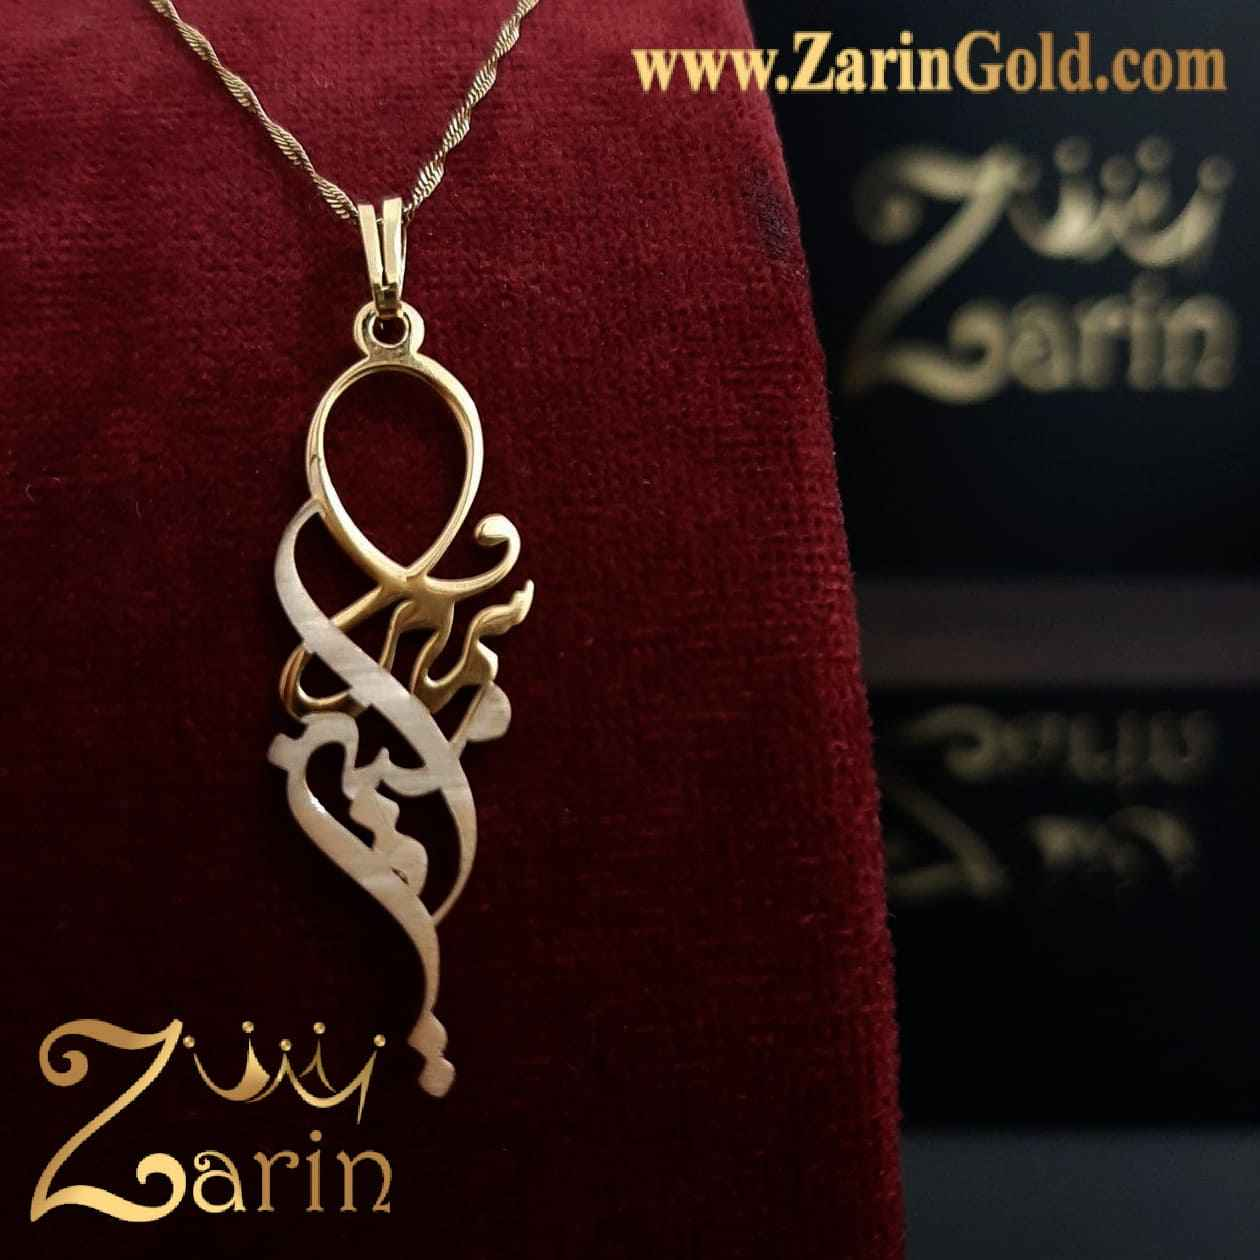 پلاک طلا دو اسم سمیرا امیر با زنجیر طلا